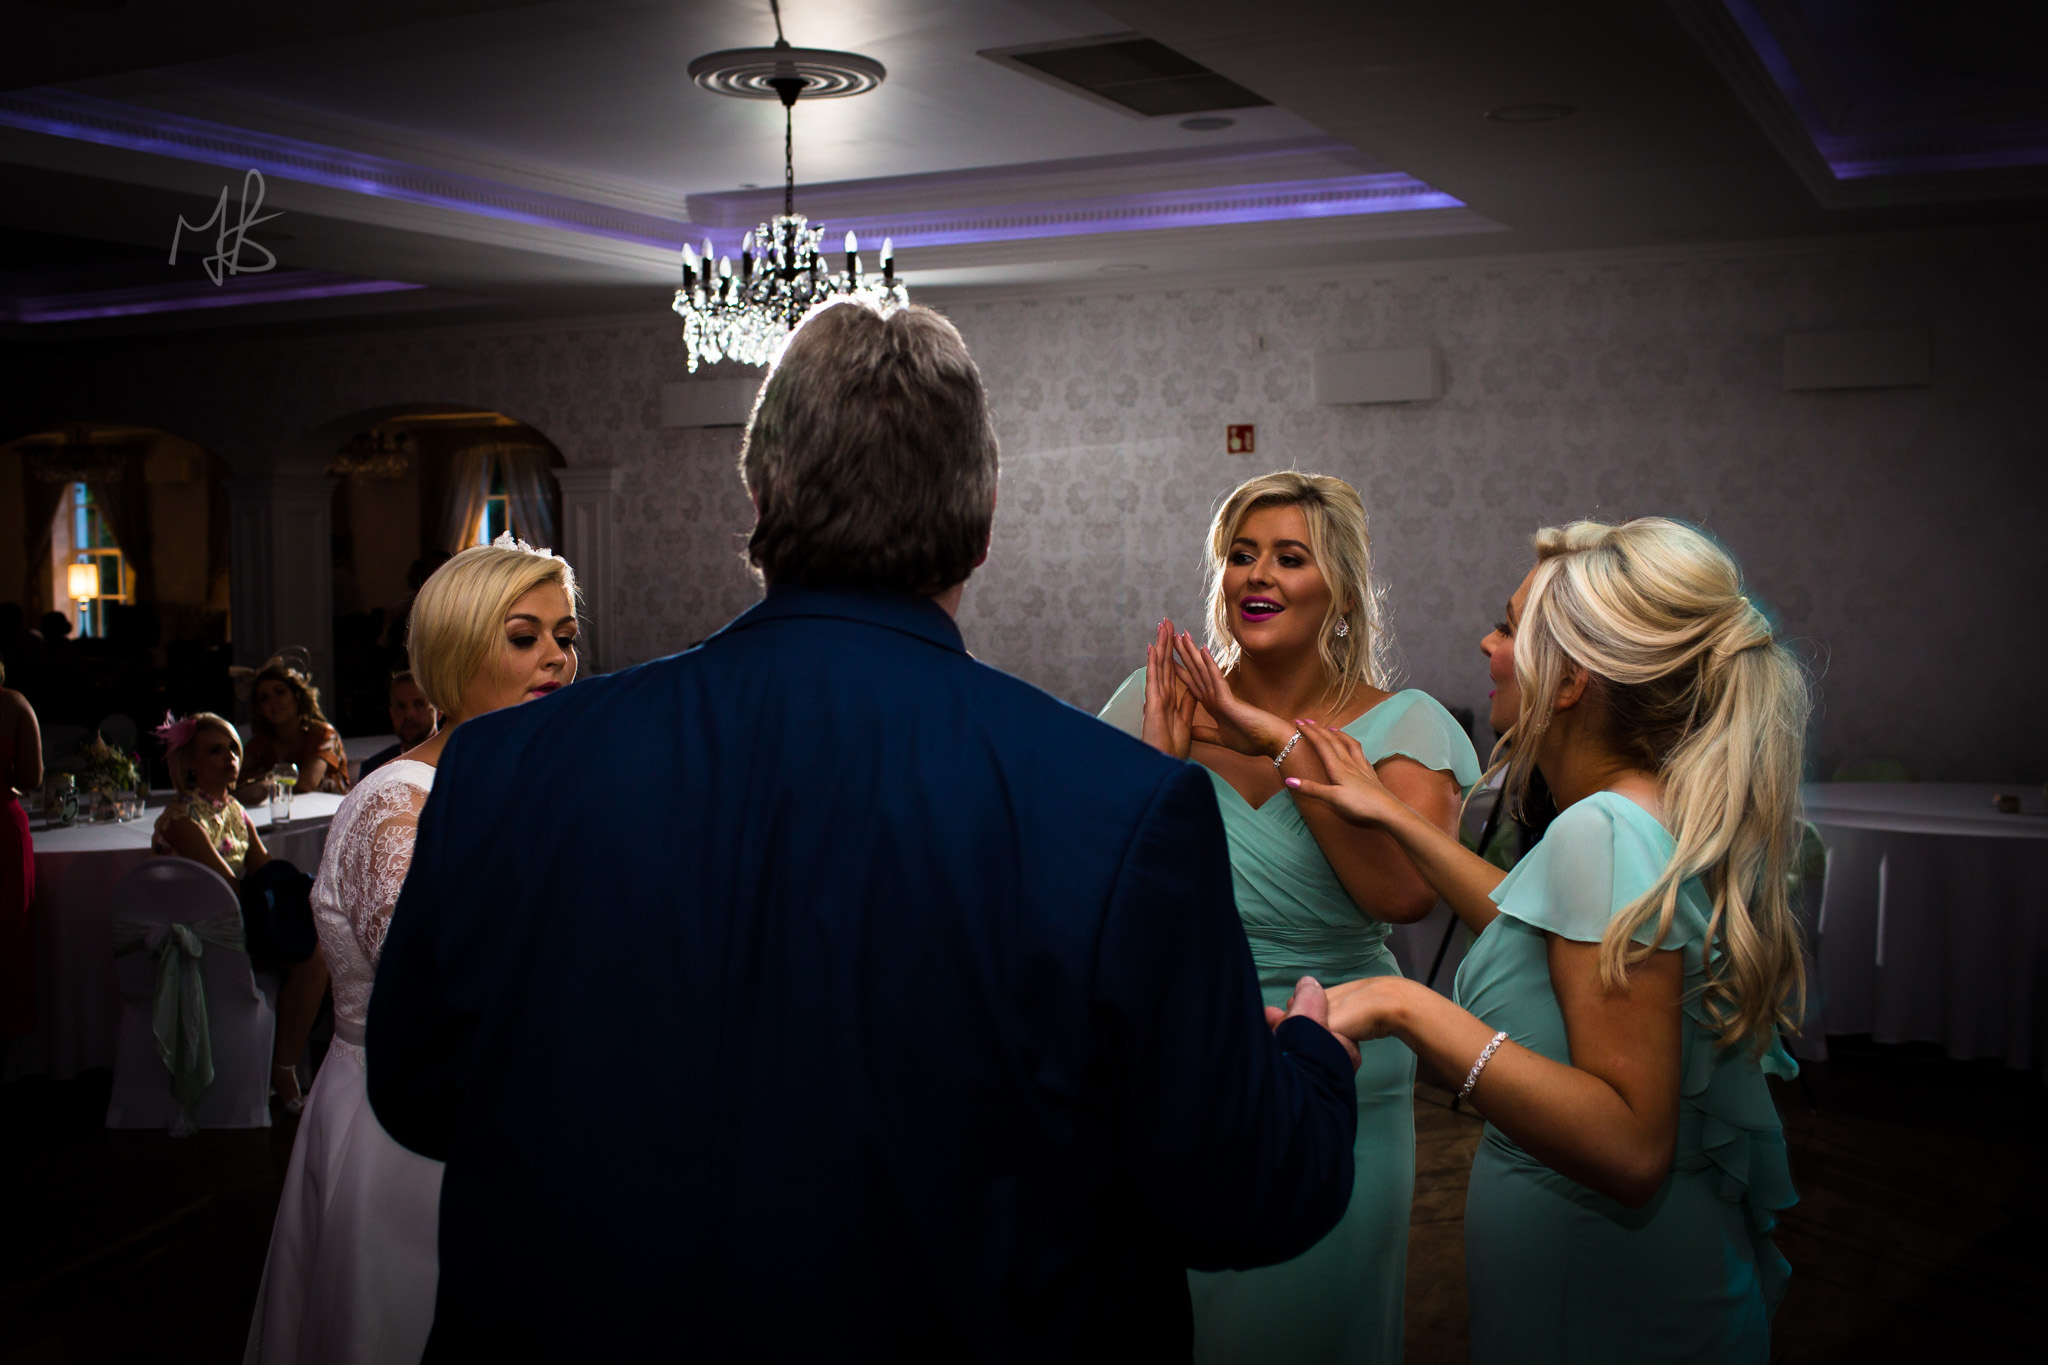 Northern-Ireland-Wedding-Photographer-Mark-Barnes-Ballymena_wedding-photography-Leighinmohr-House-Seamas_Alanna_For-web-61.jpg